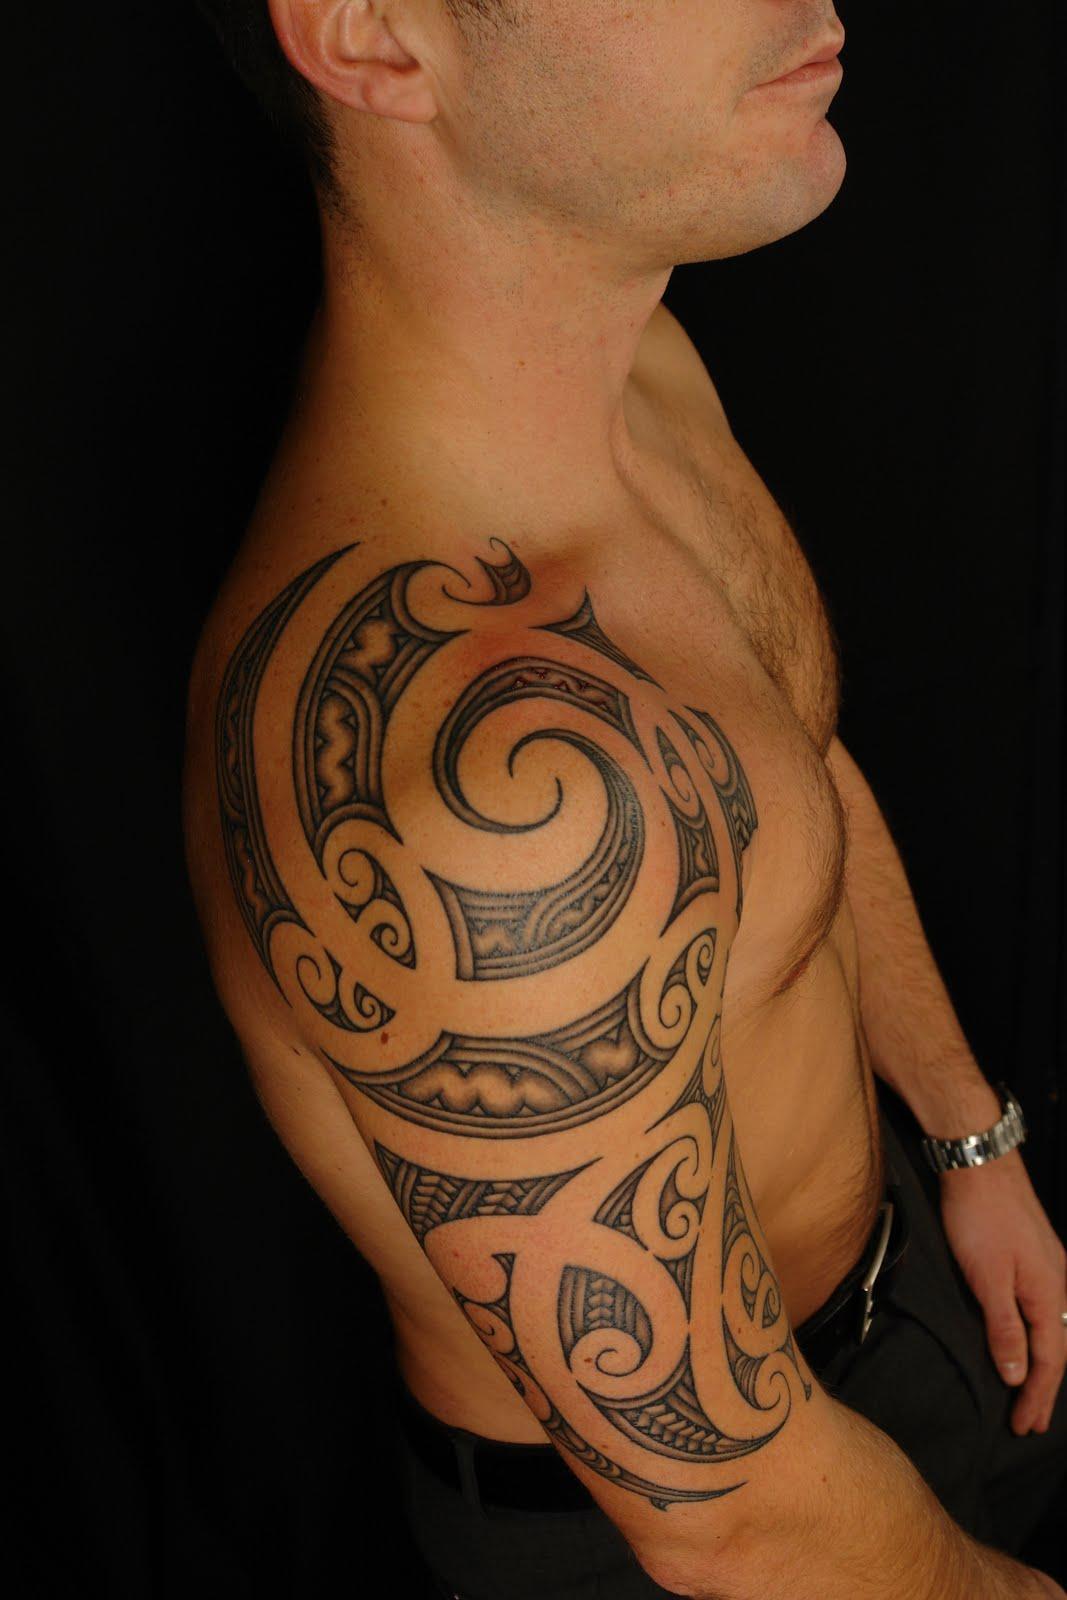 Mana Maori Shop'n'Tatau Nancy Tattoo & Piercing Arts  - tatouage maori polynésien